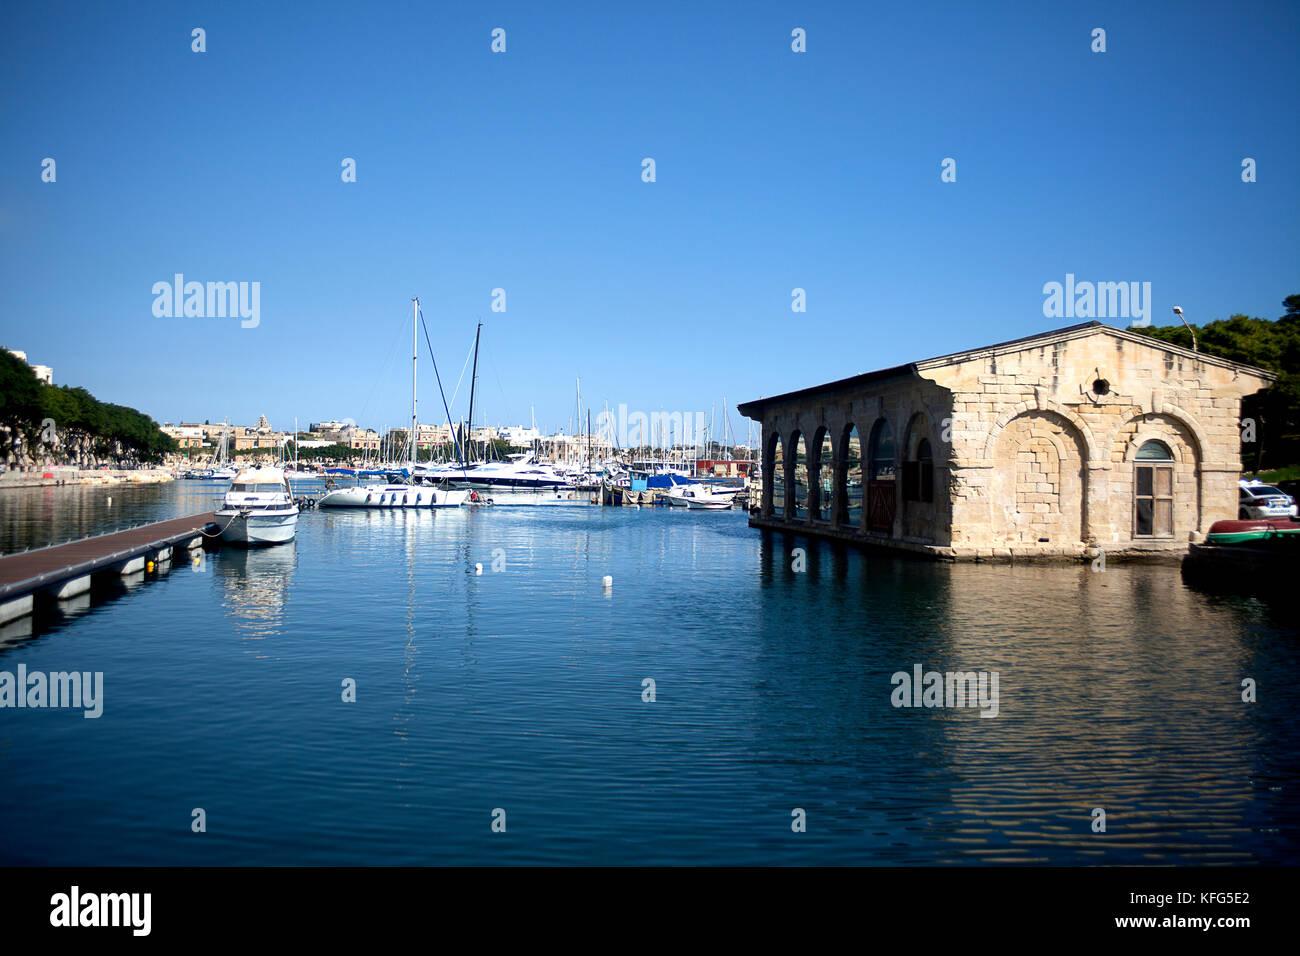 Yacht marina - Stock Image